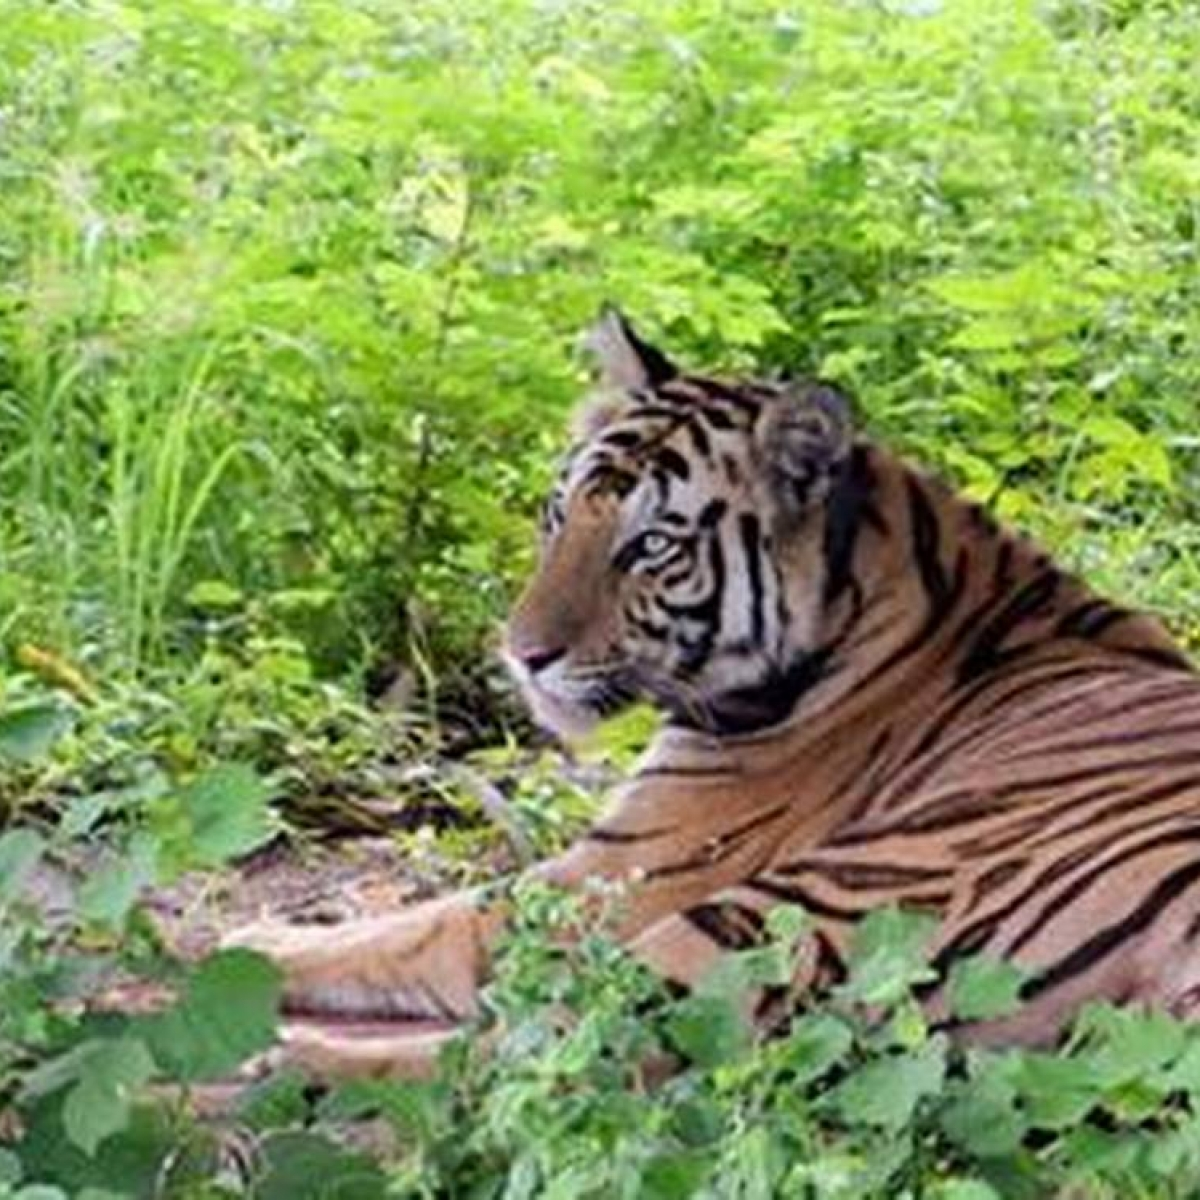 Madhya Pradesh: If all goes well,  Tigress 'Sundri' will be back in Kanha Tiger Reserve soon